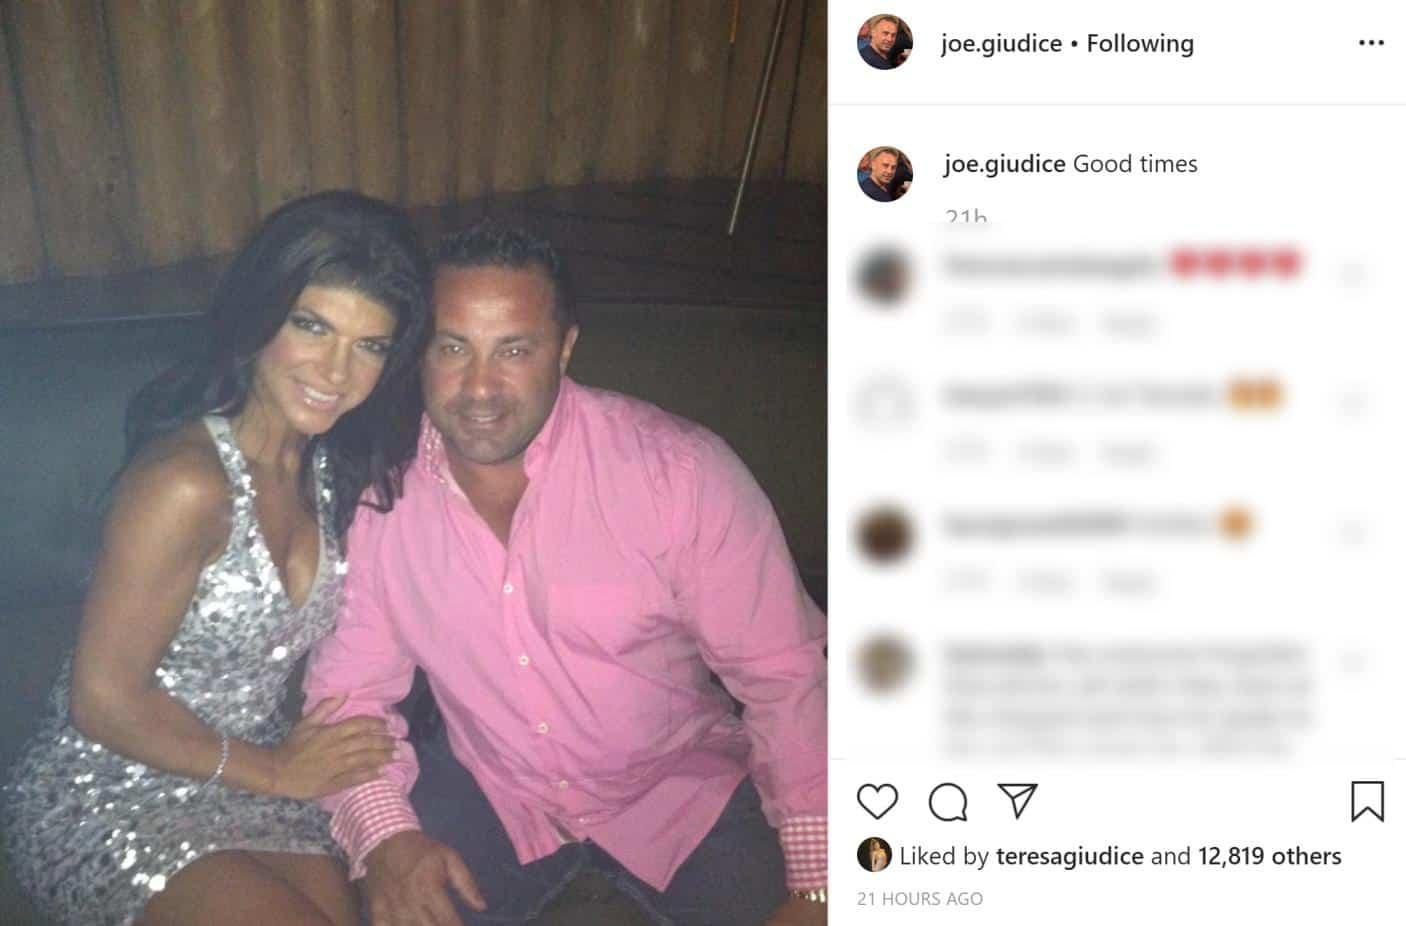 Teresa Giudice likes Joe Giudice's Instagram Post